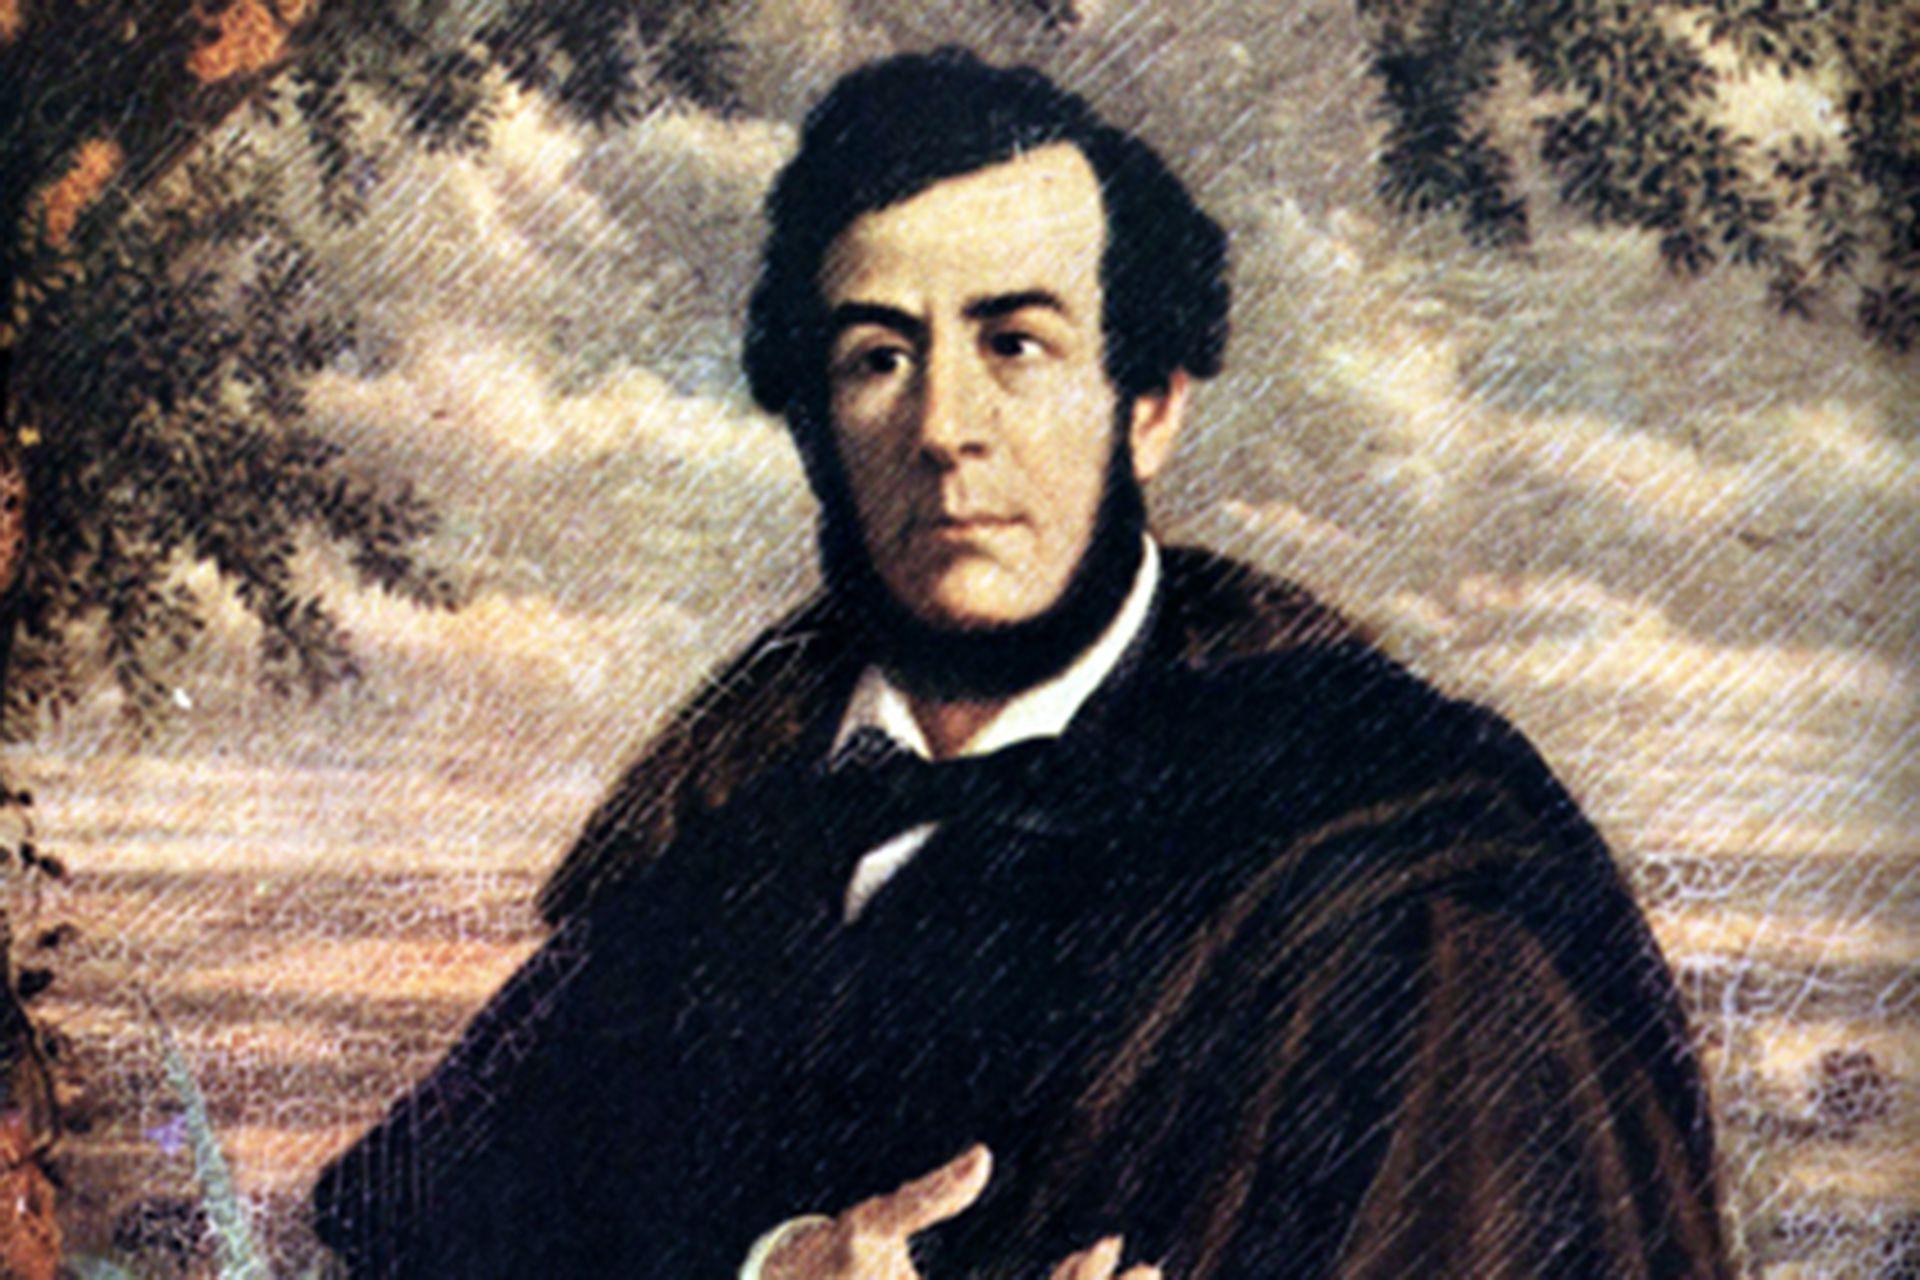 Esteban Echeverría en una pintura de Ernest Charton